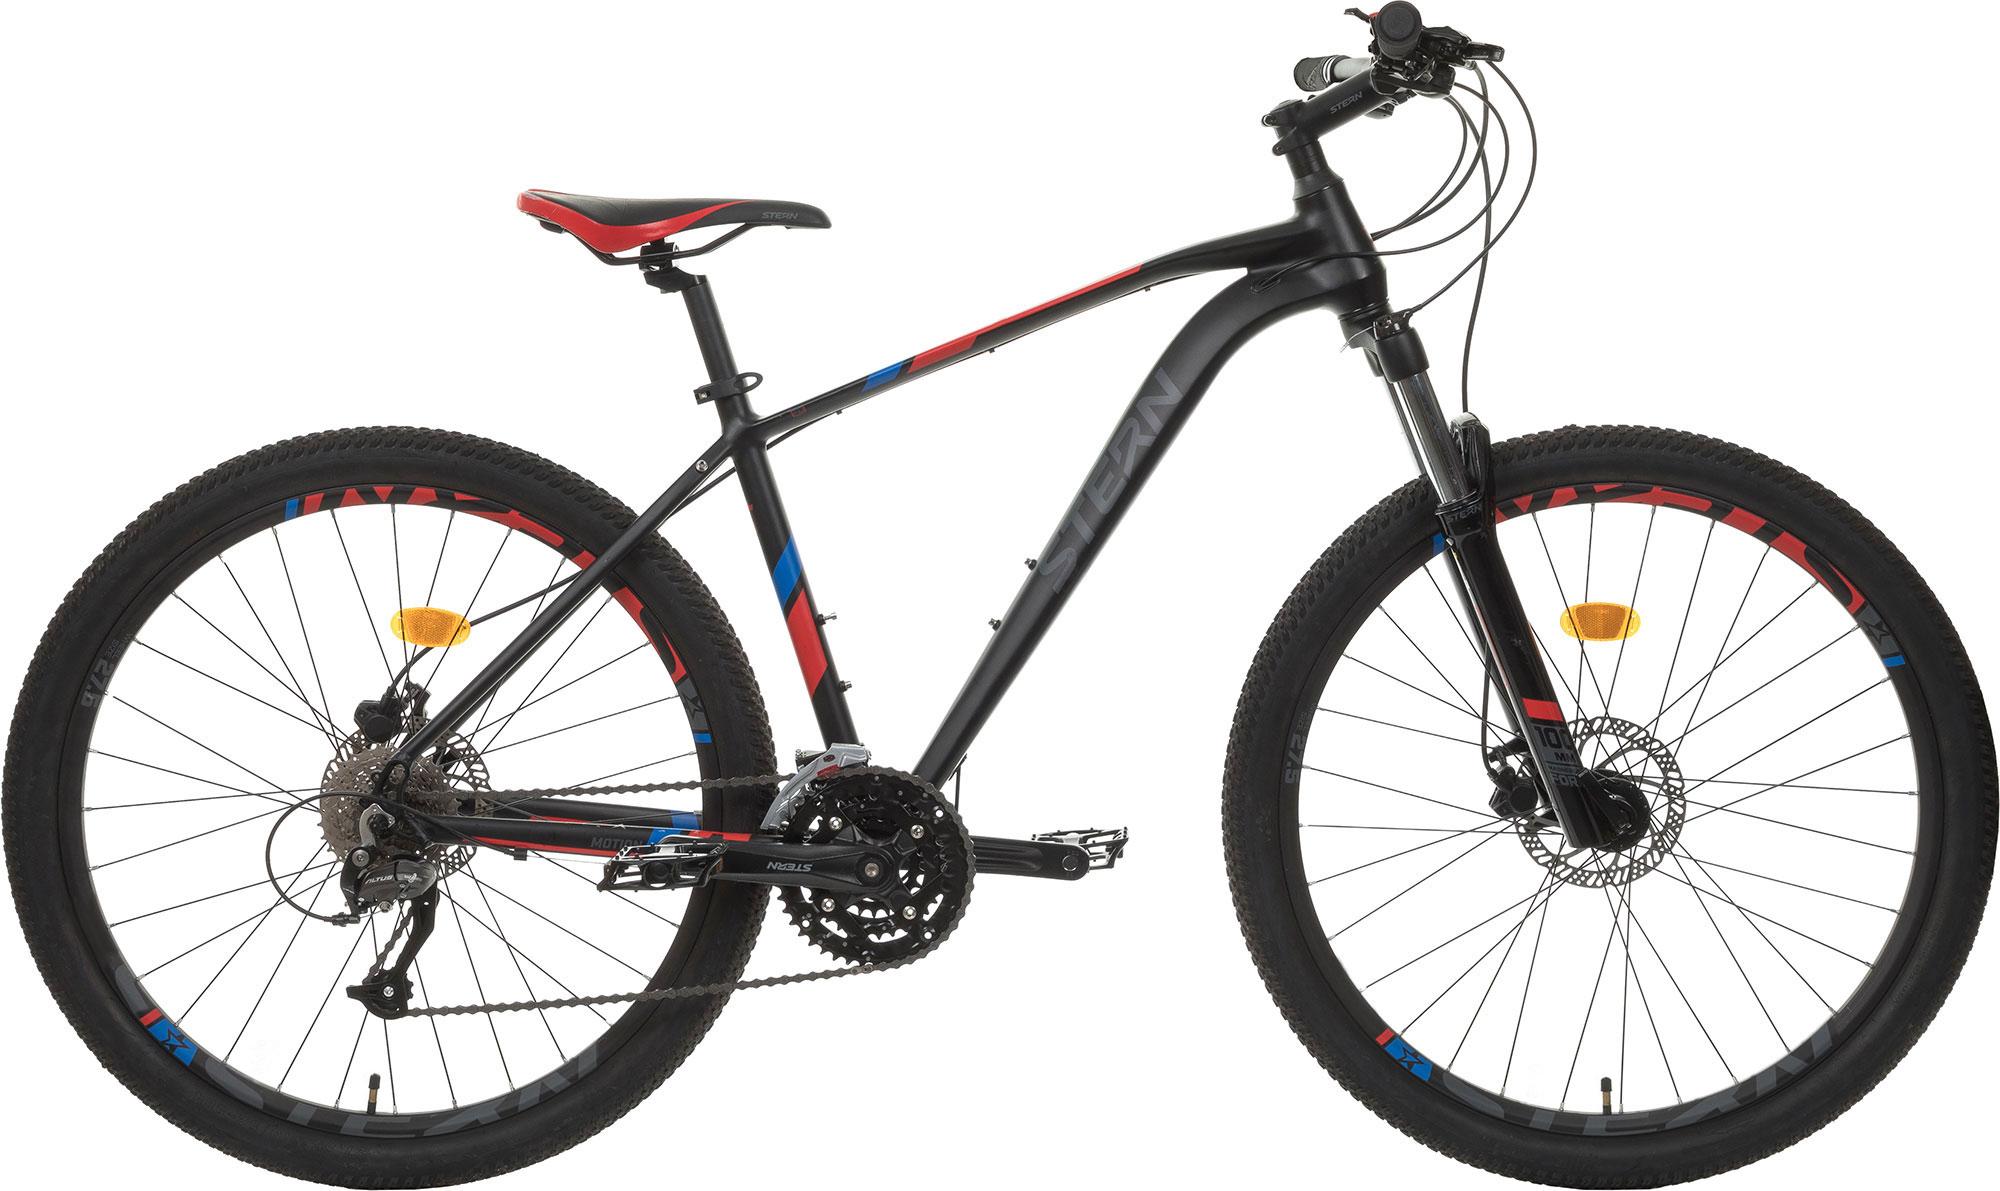 Stern Велосипед горный Stern Motion 4.0 27,5, размер 165-175 stern stern dynamic 1 0 26 2018 размер 150 165